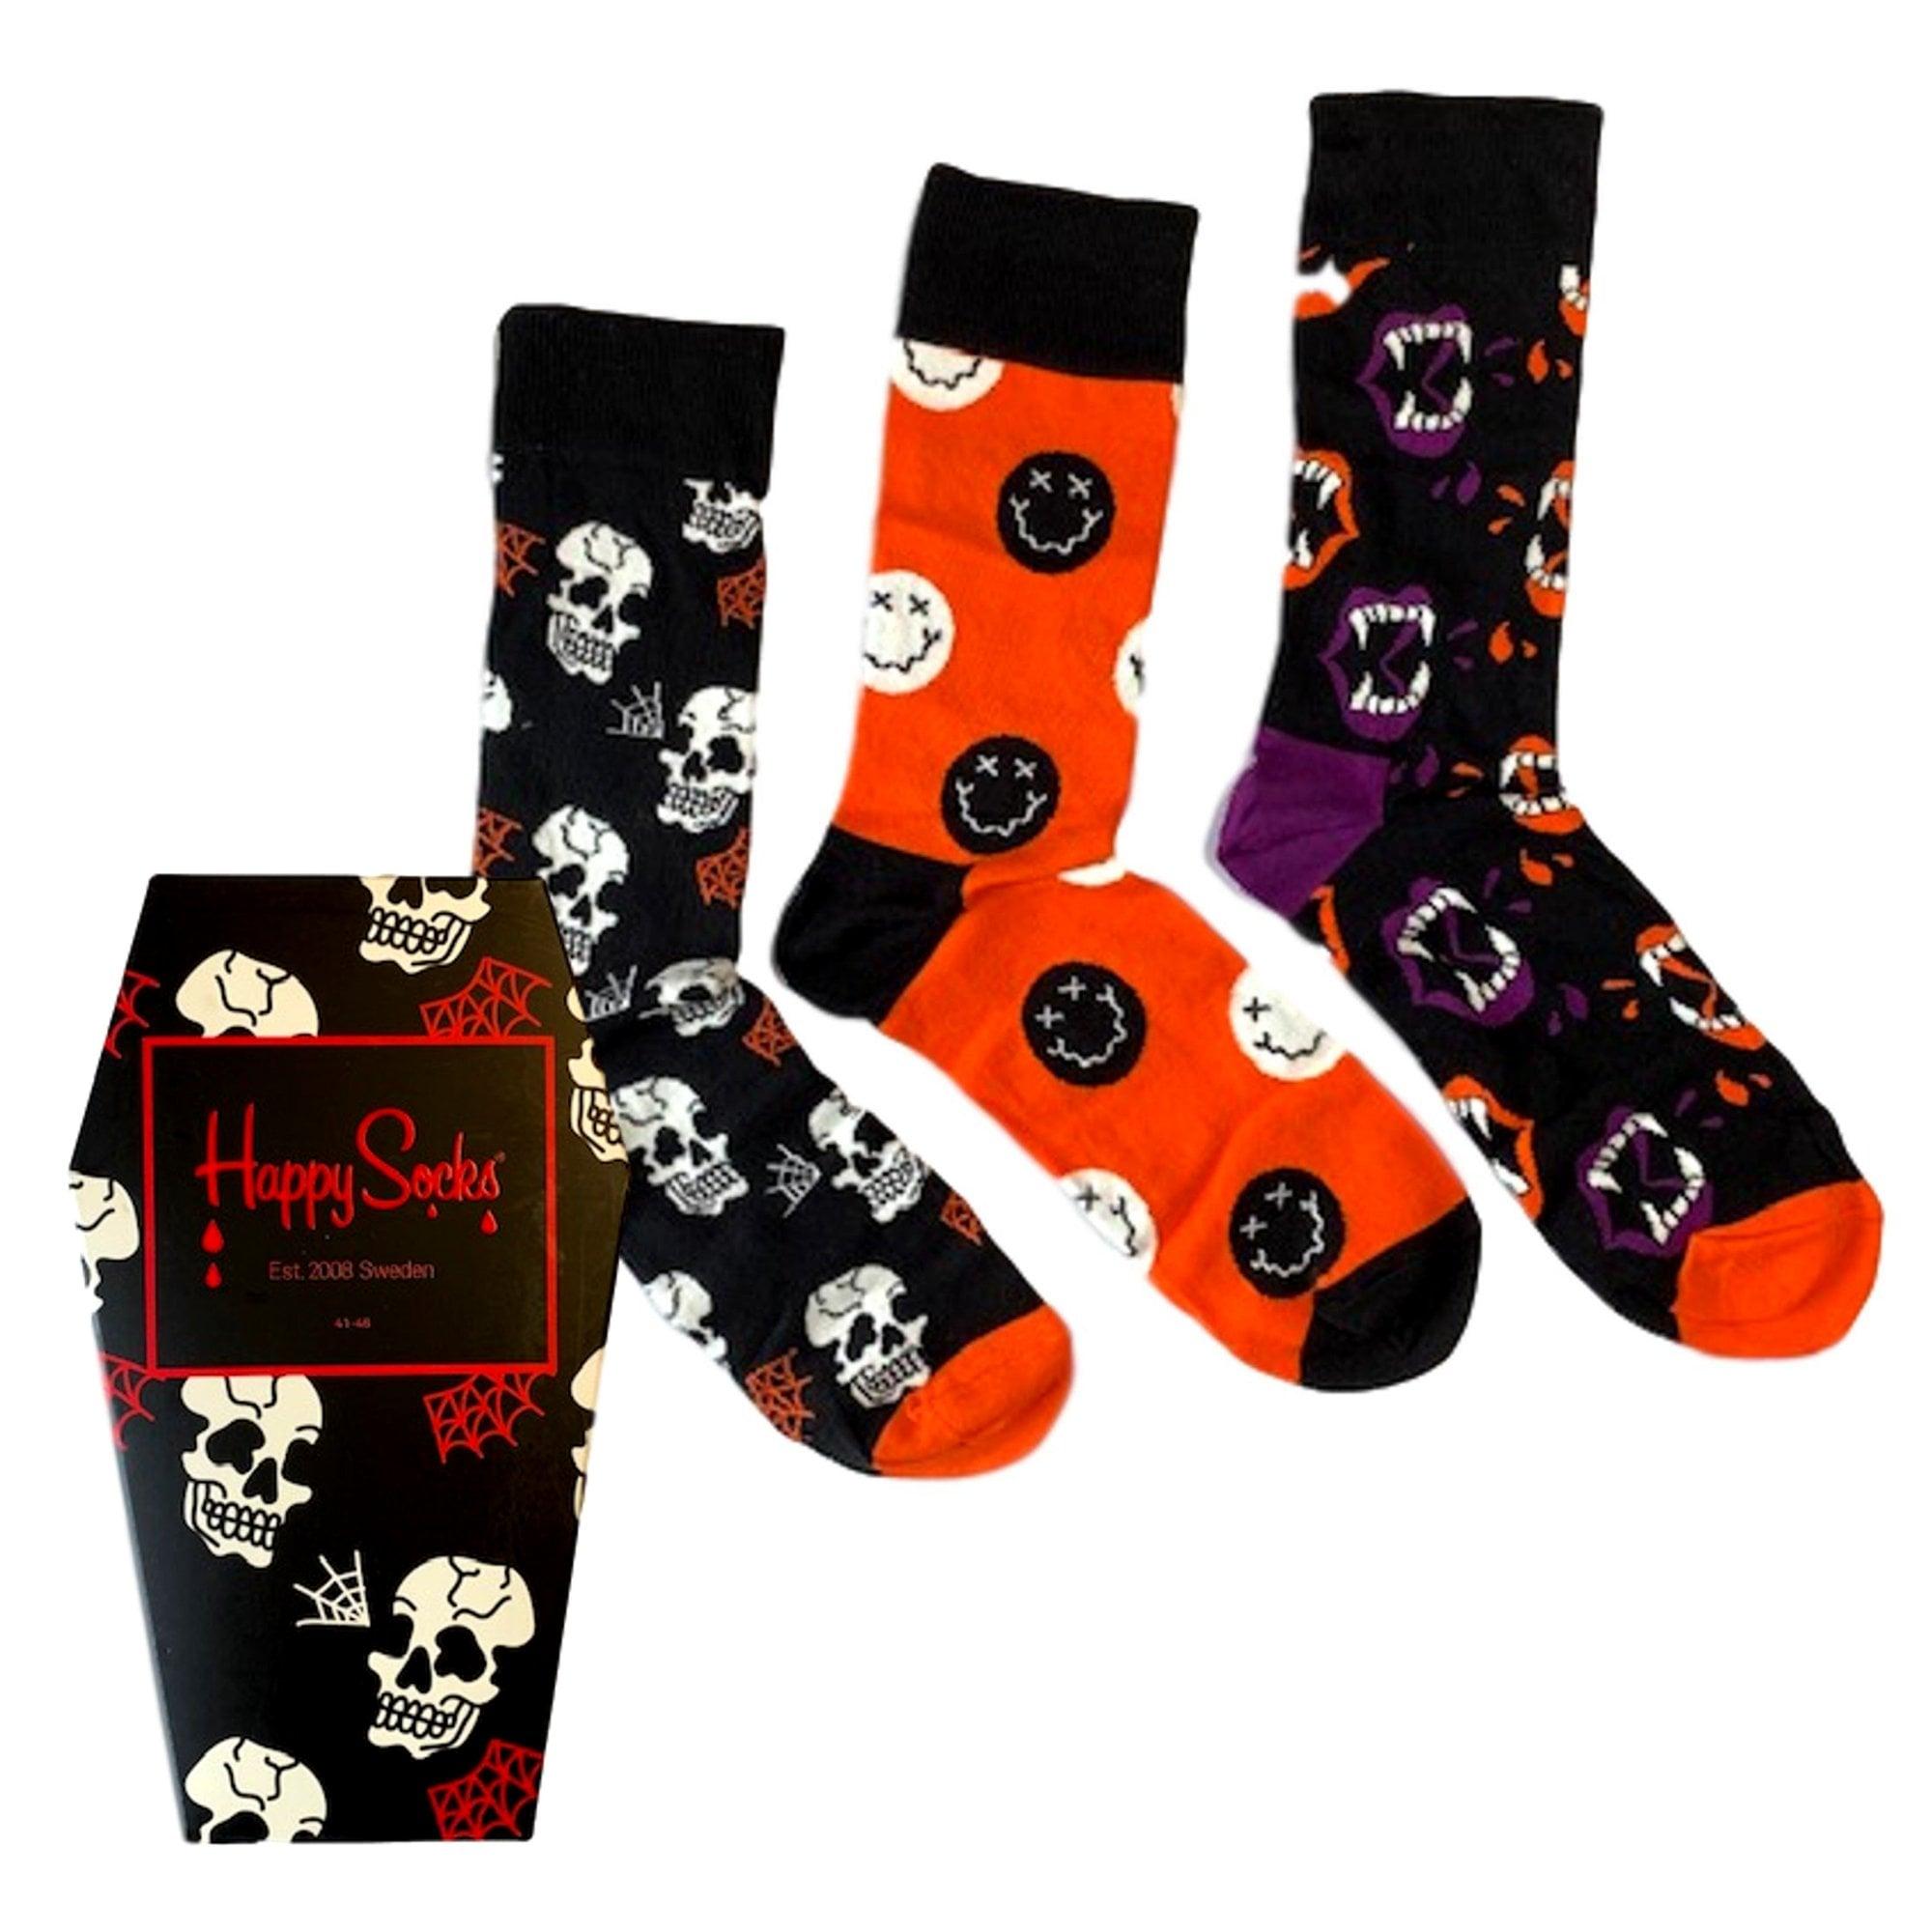 happy-socks-halloween-gift-box-3-pack-p2780-10384_zoom.jpg